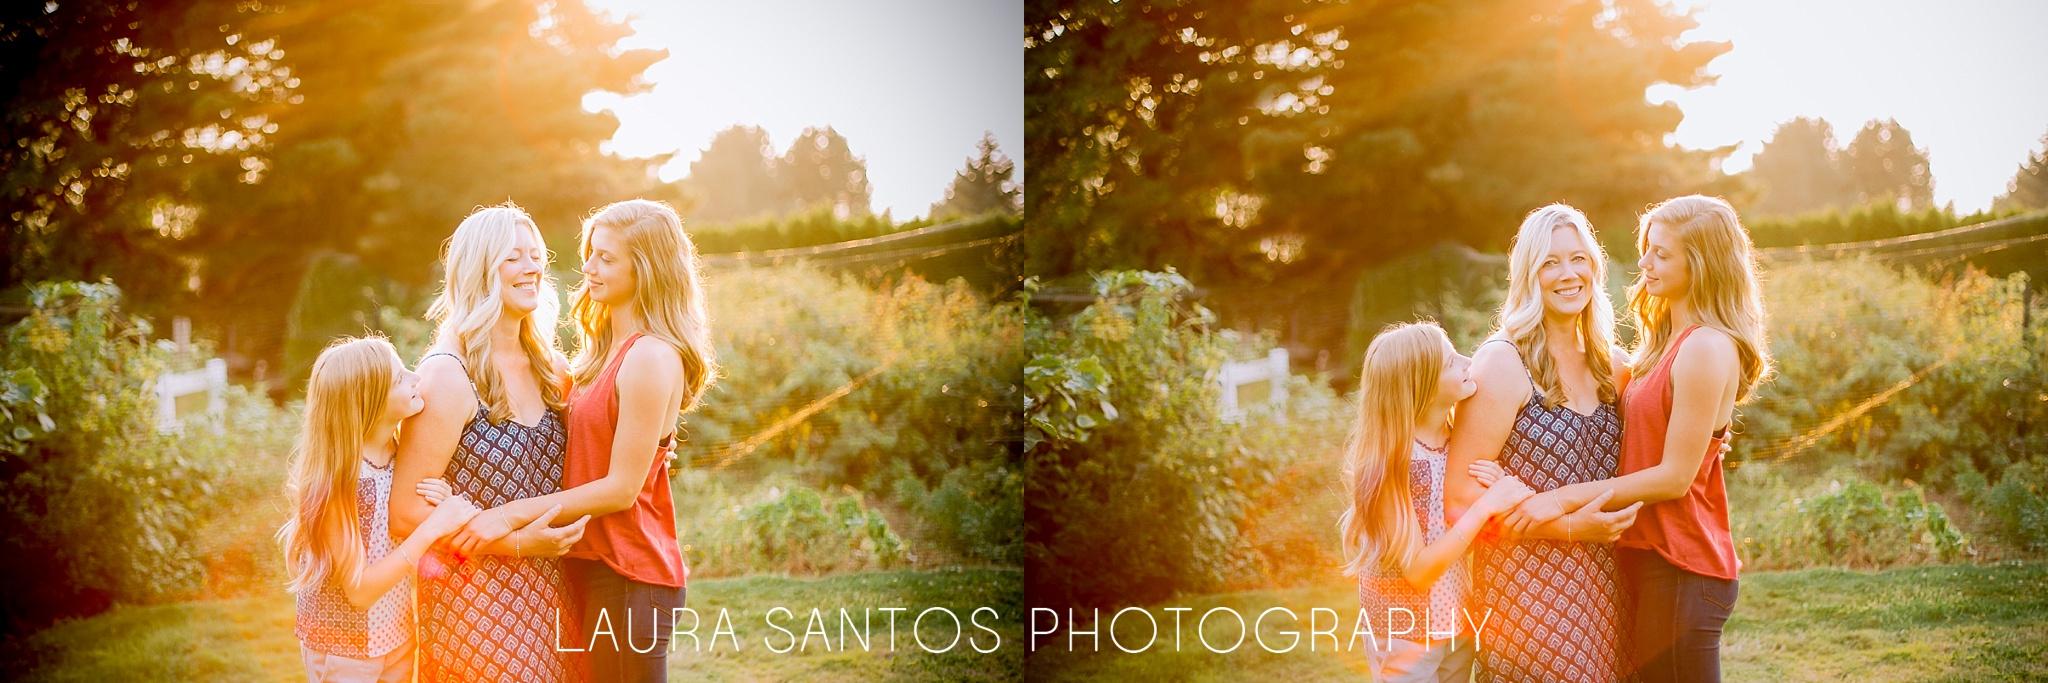 Laura Santos Photography Portland Oregon Family Photographer_0215.jpg